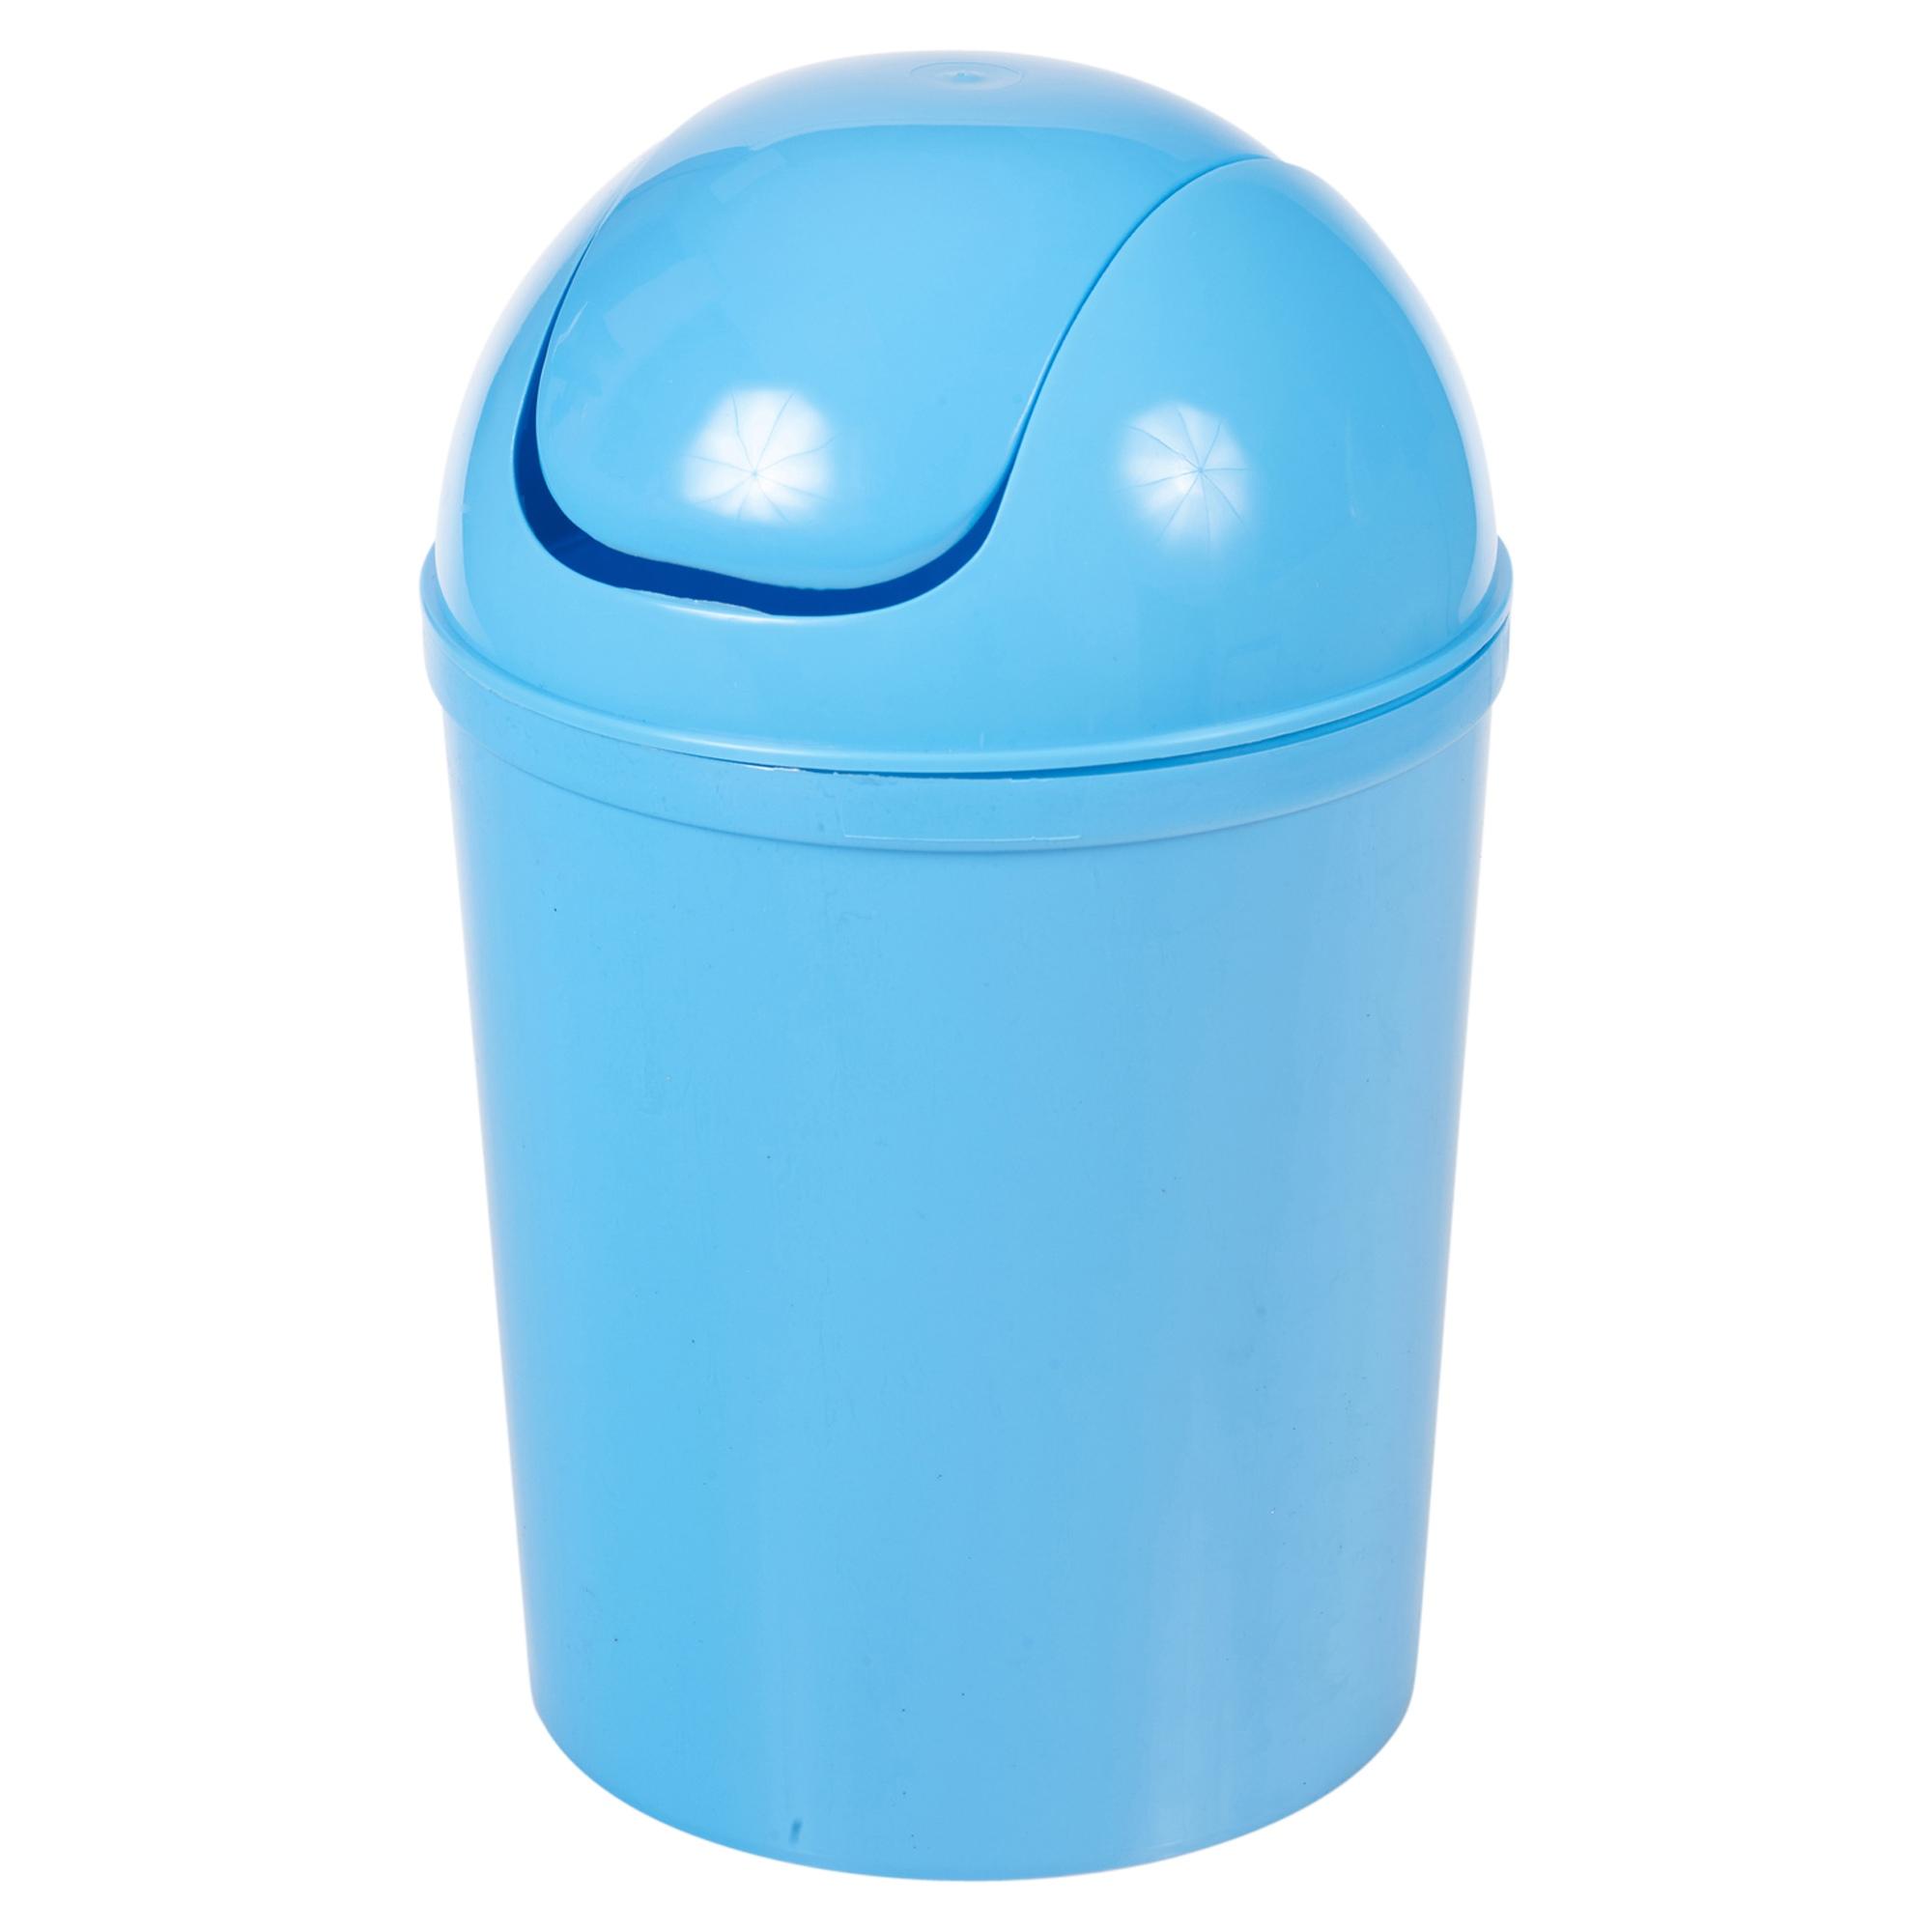 Plastic 5 Liter Pedal Operated Waste Dustbin Rubbish Garbage Bin ...